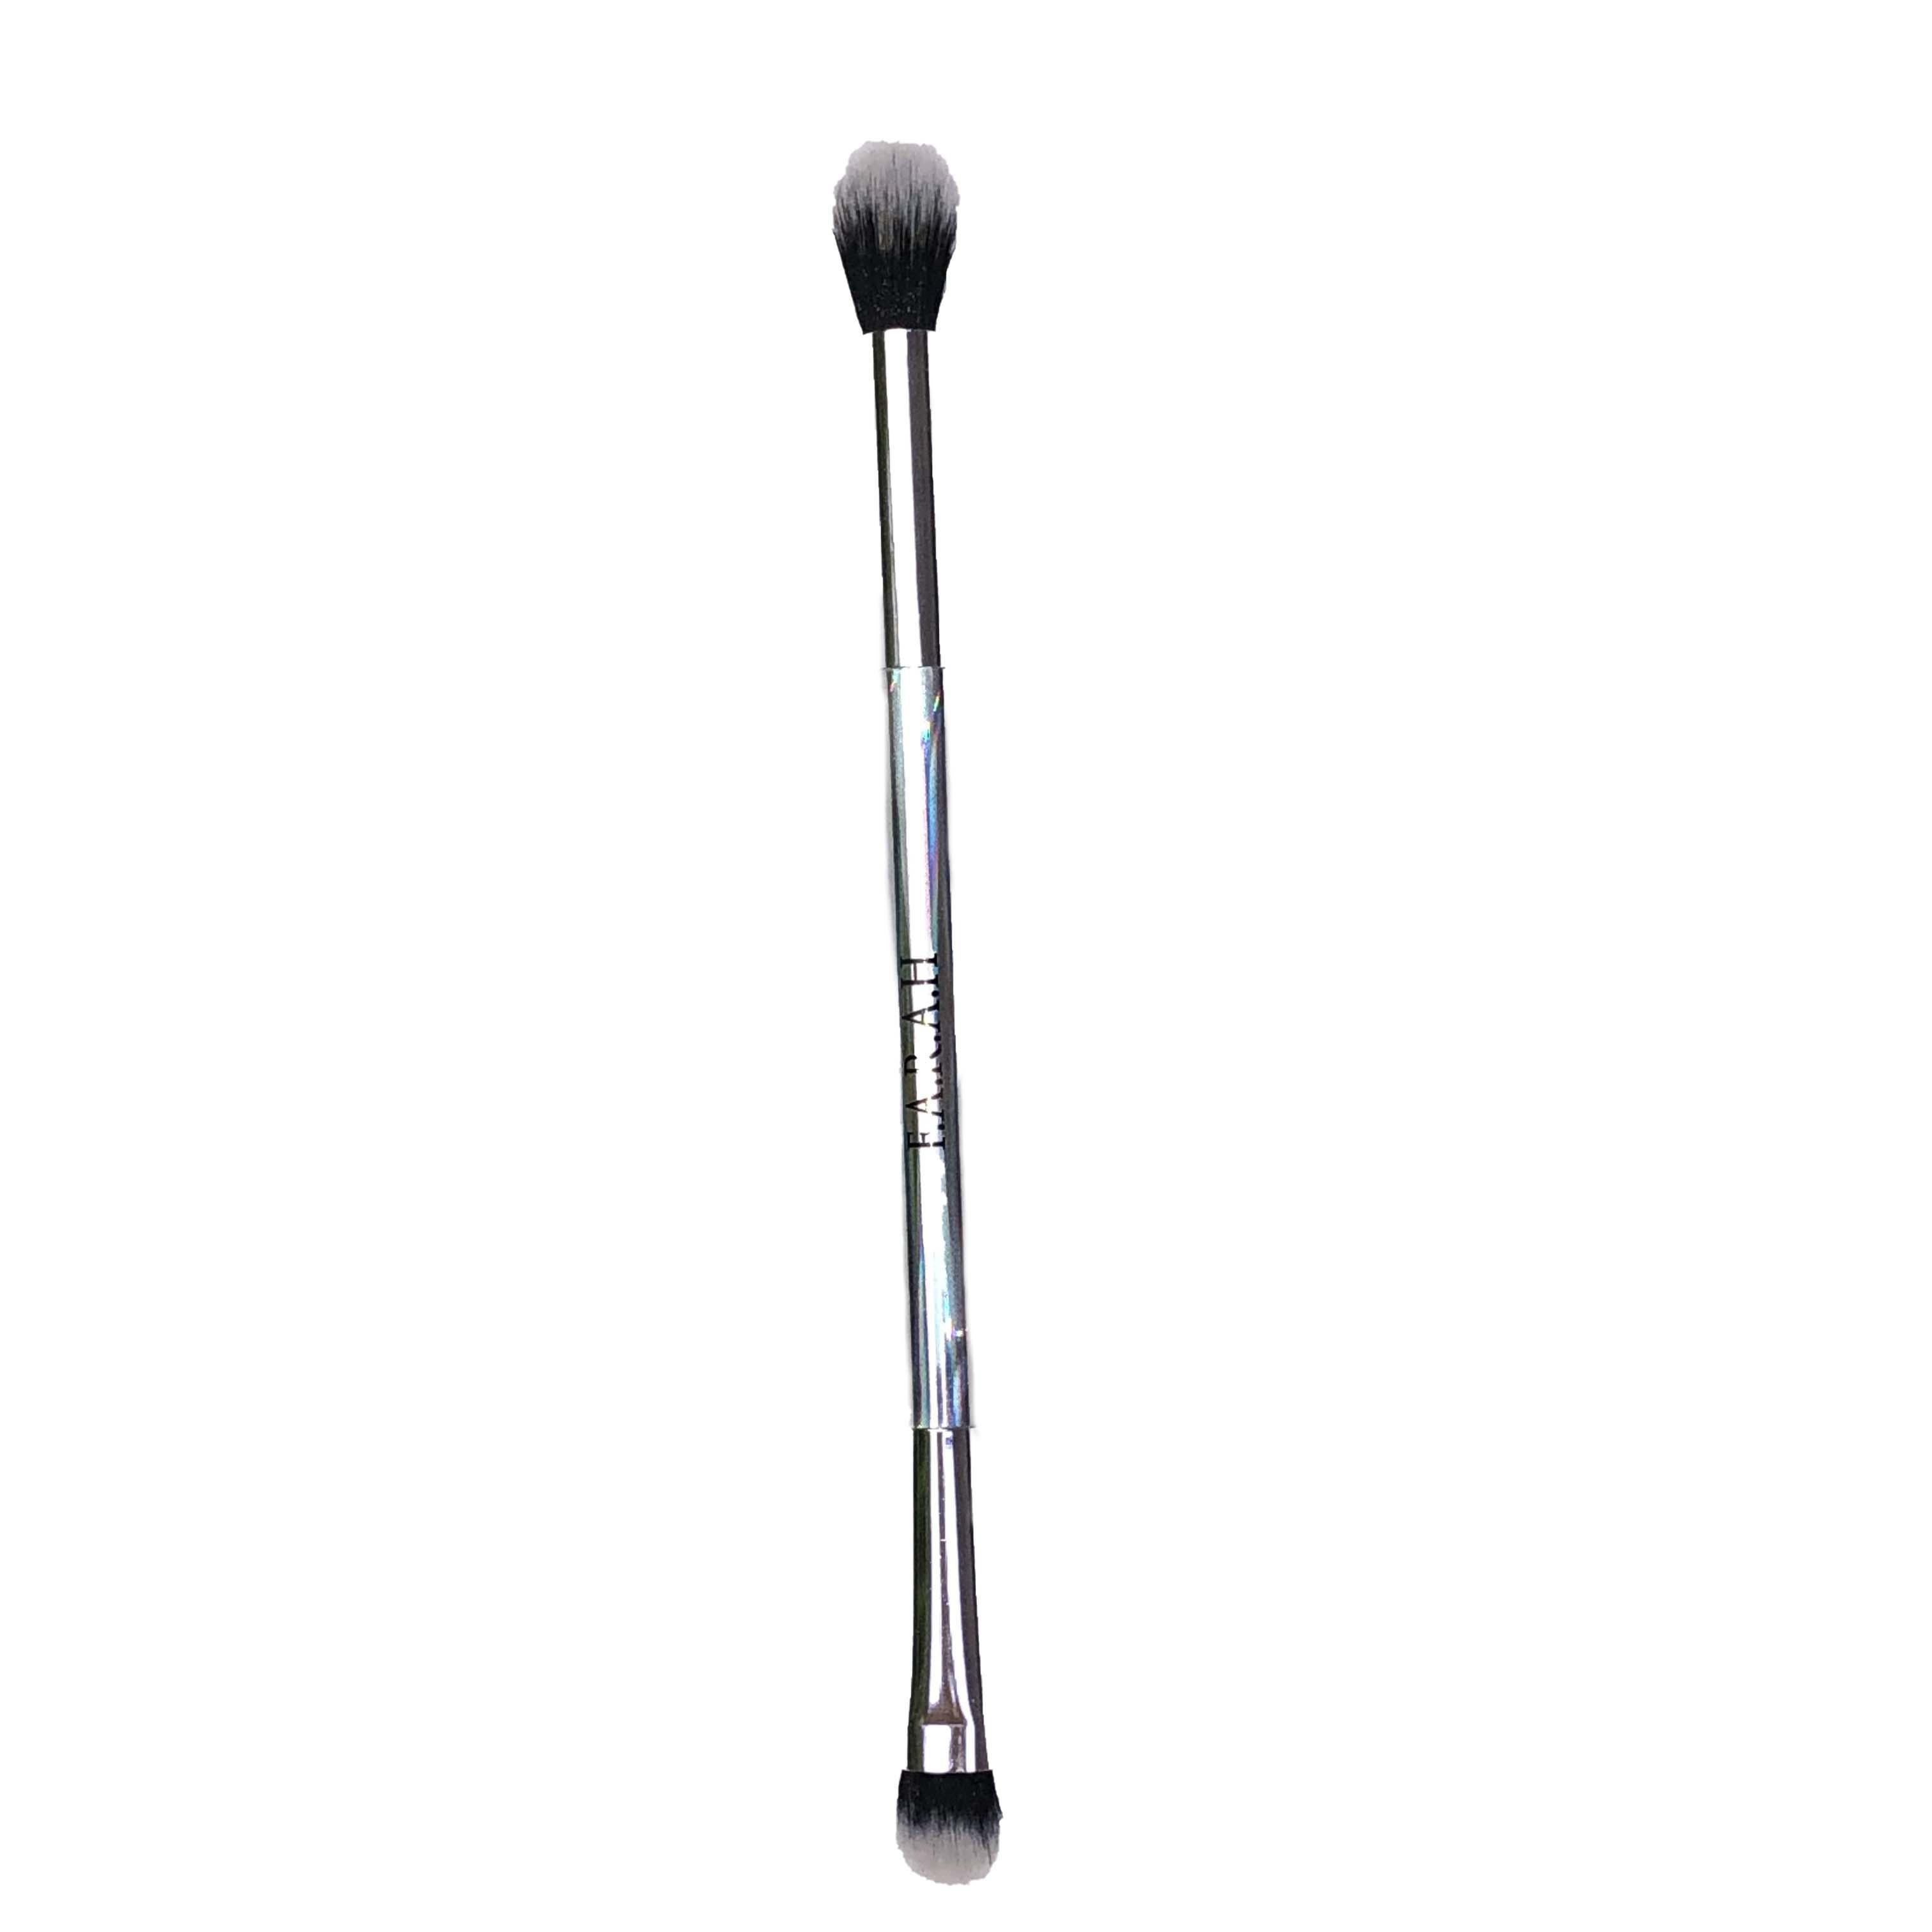 FARAH Cosmetics Dual-Ended Eye Shadow Brush Silver